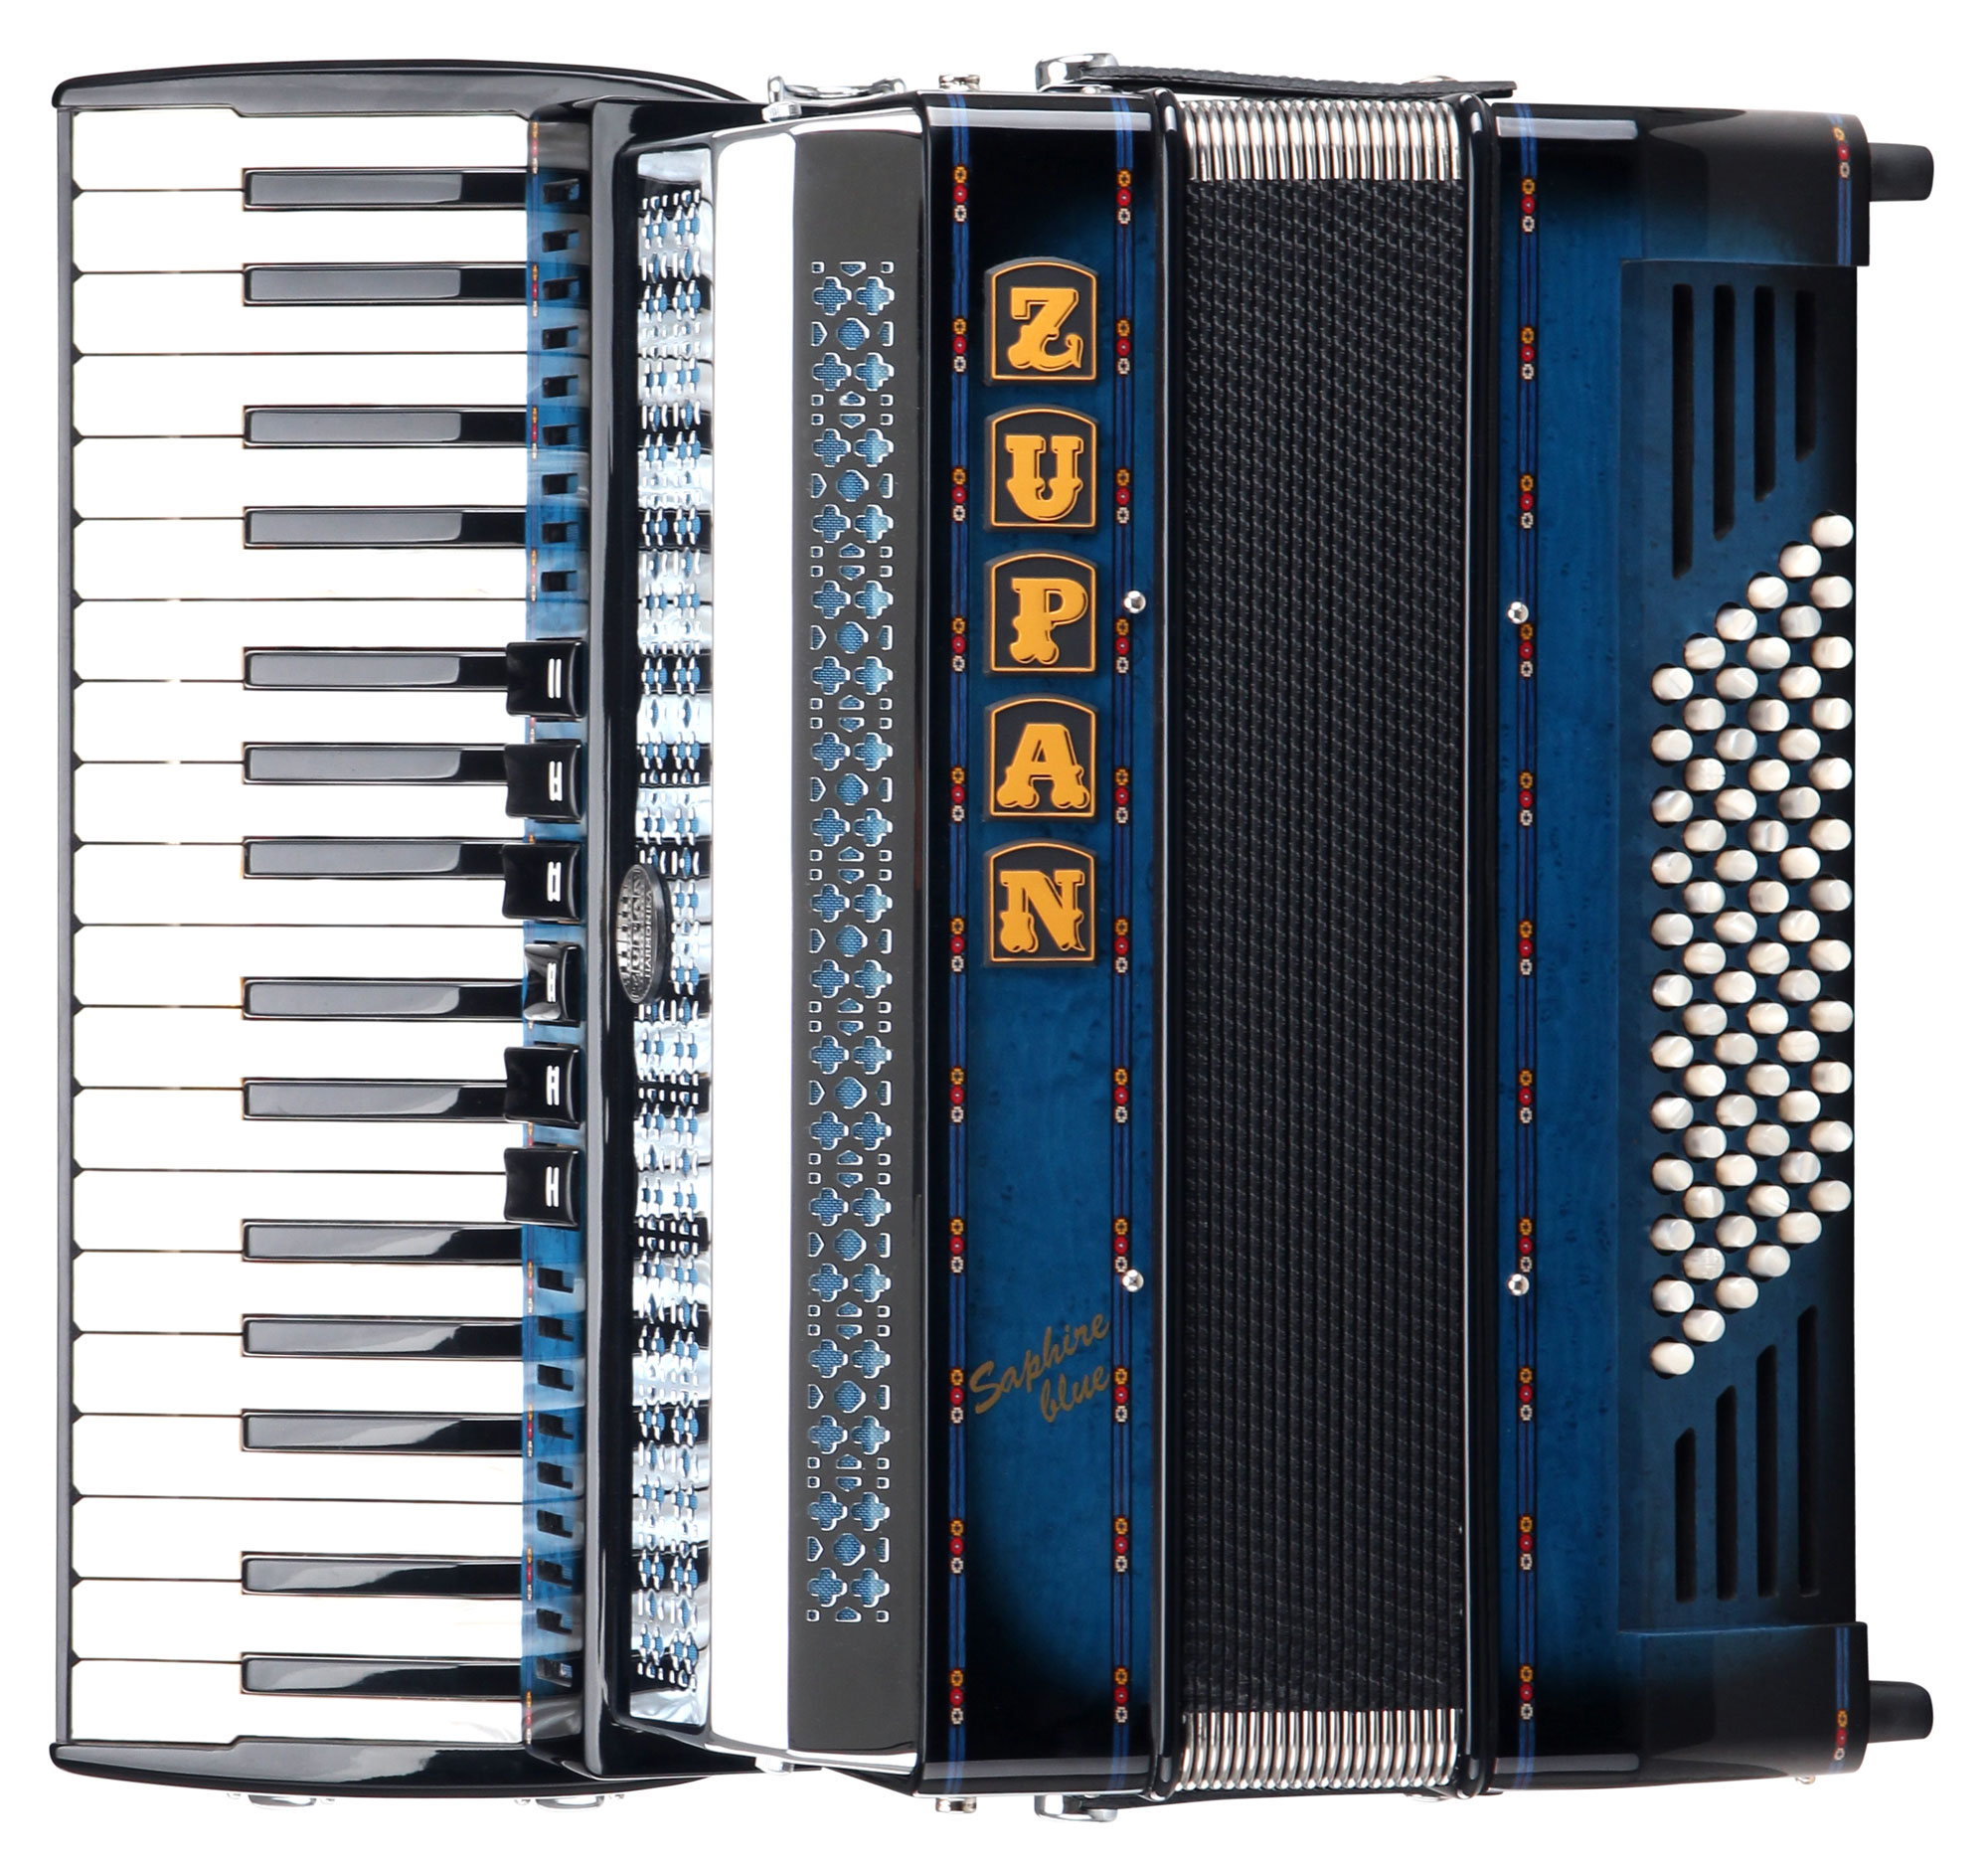 Akkordeons - Zupan Saphire III 72 MH Akkordeon Shadow Blue Retoure (Zustand wie neu) - Onlineshop Musikhaus Kirstein